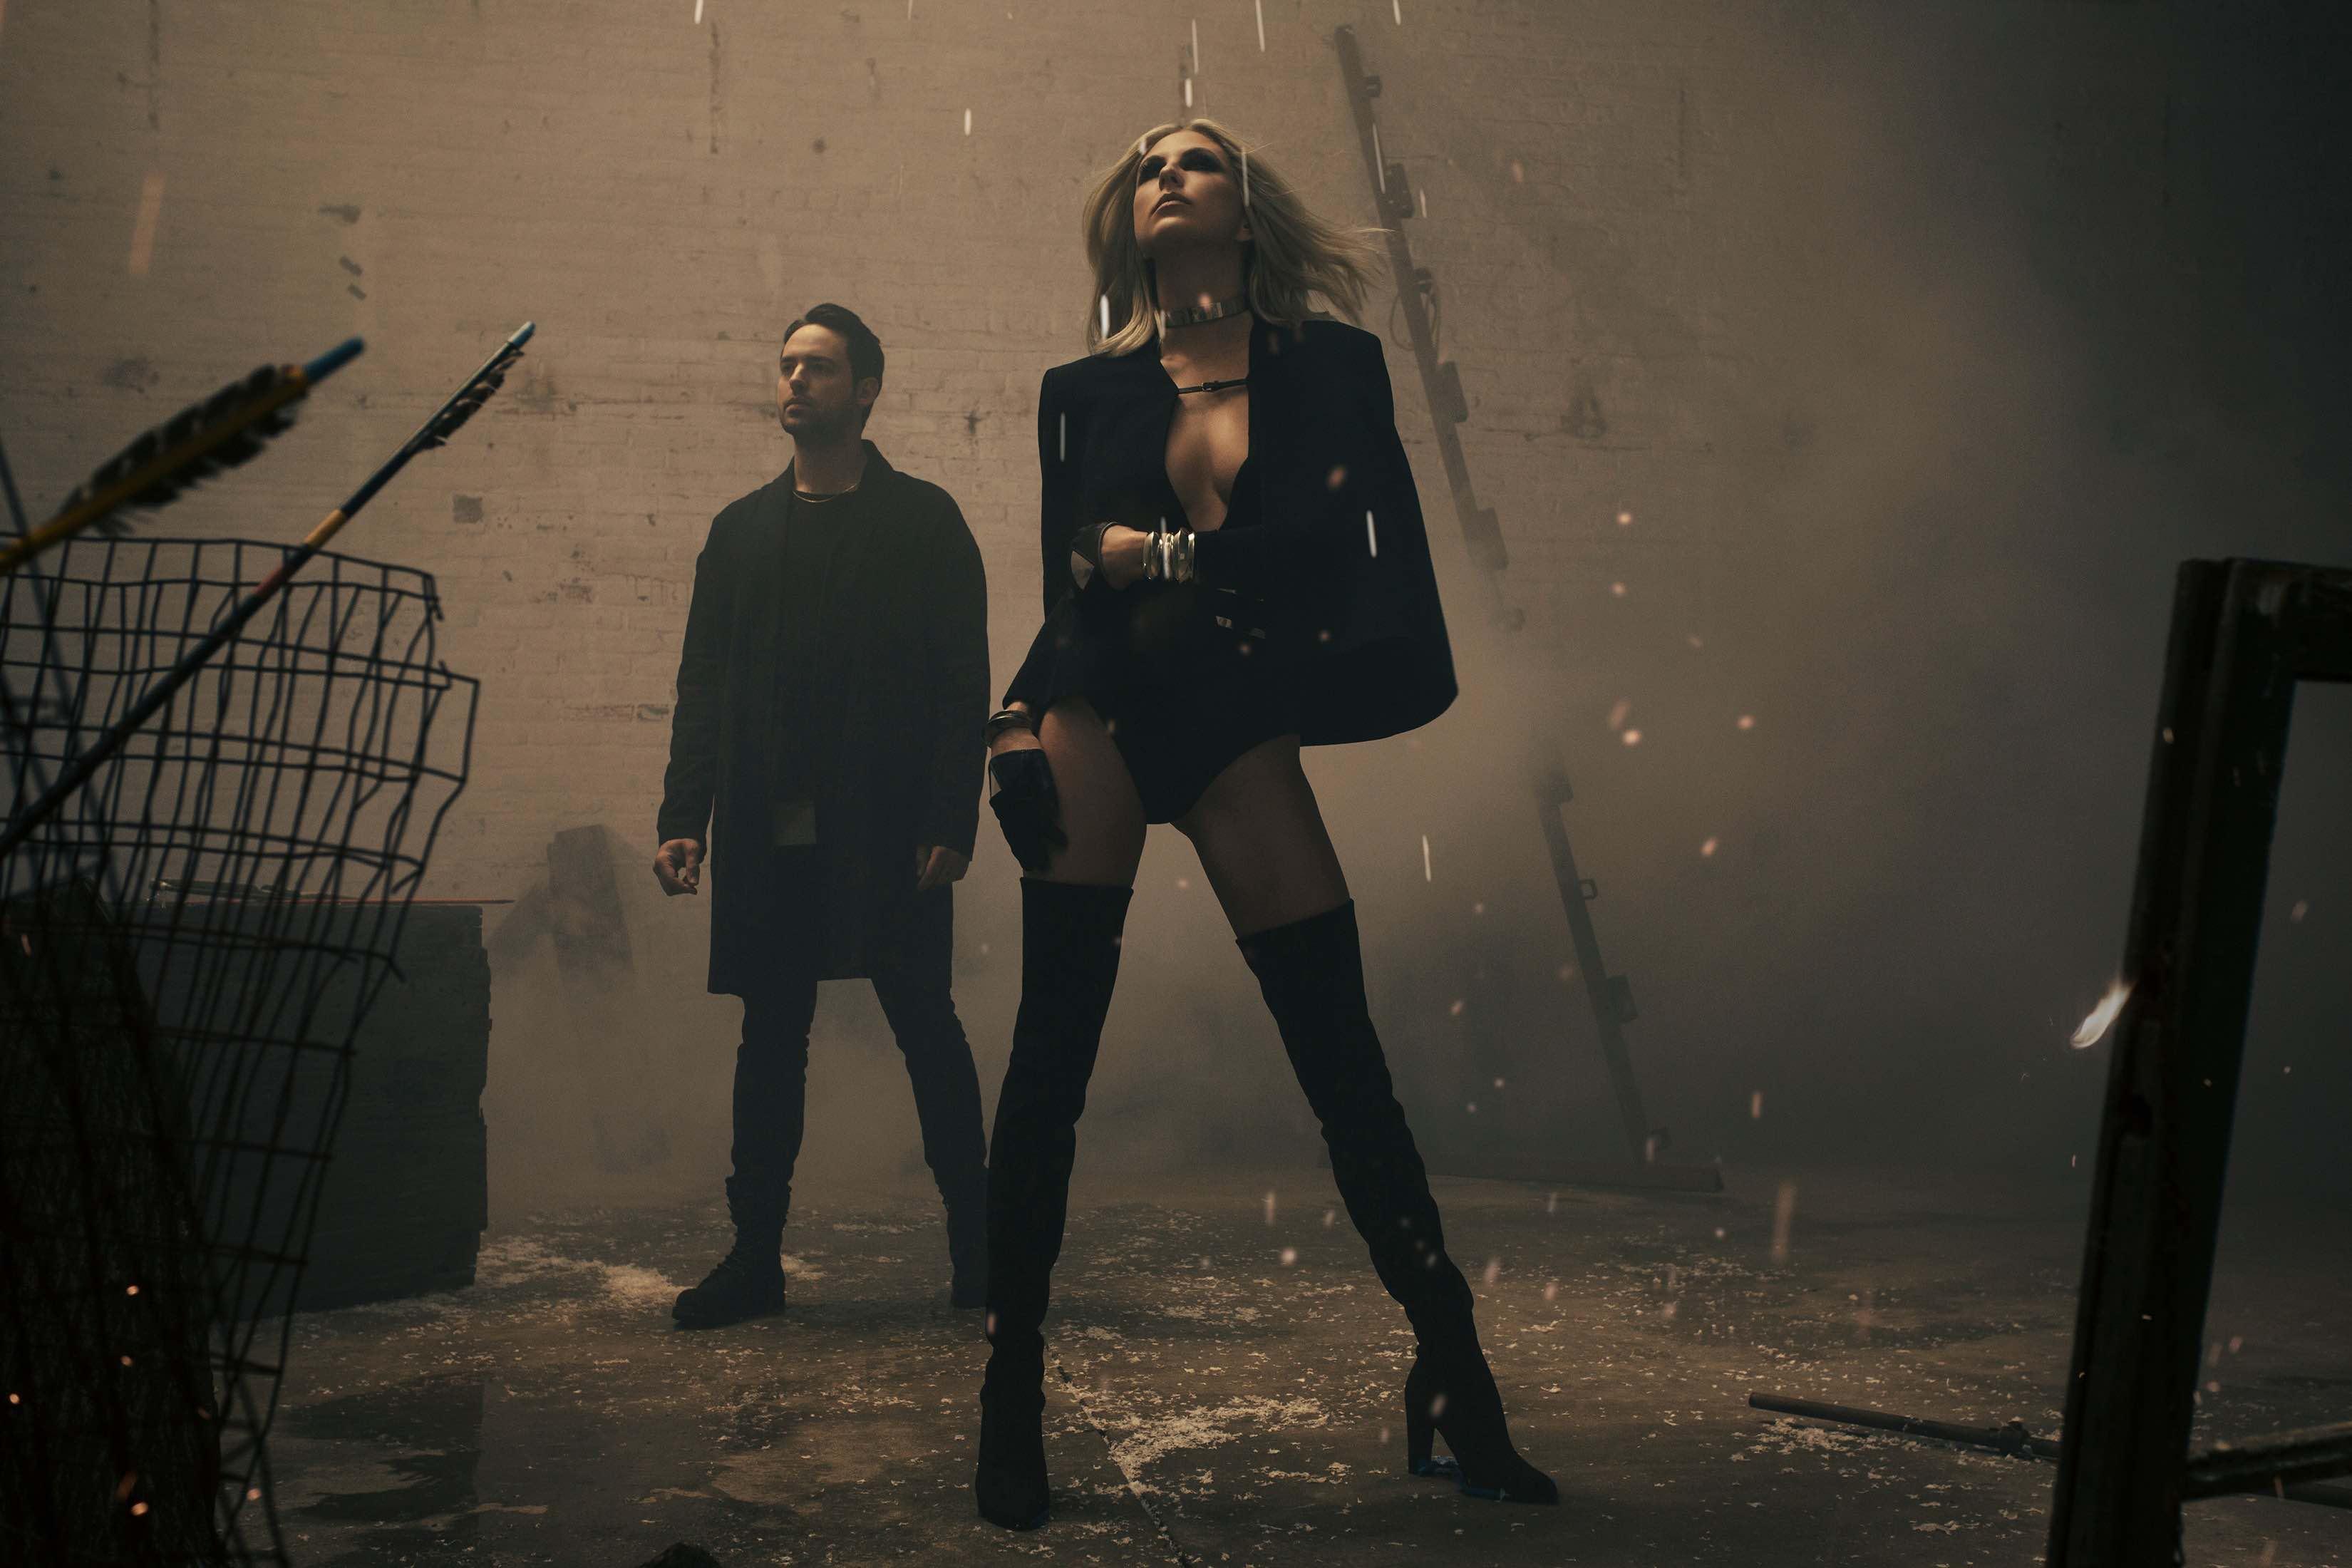 phantogram-three-nouvel-album-du-duo-electro-pop-us-muse-effronte-04